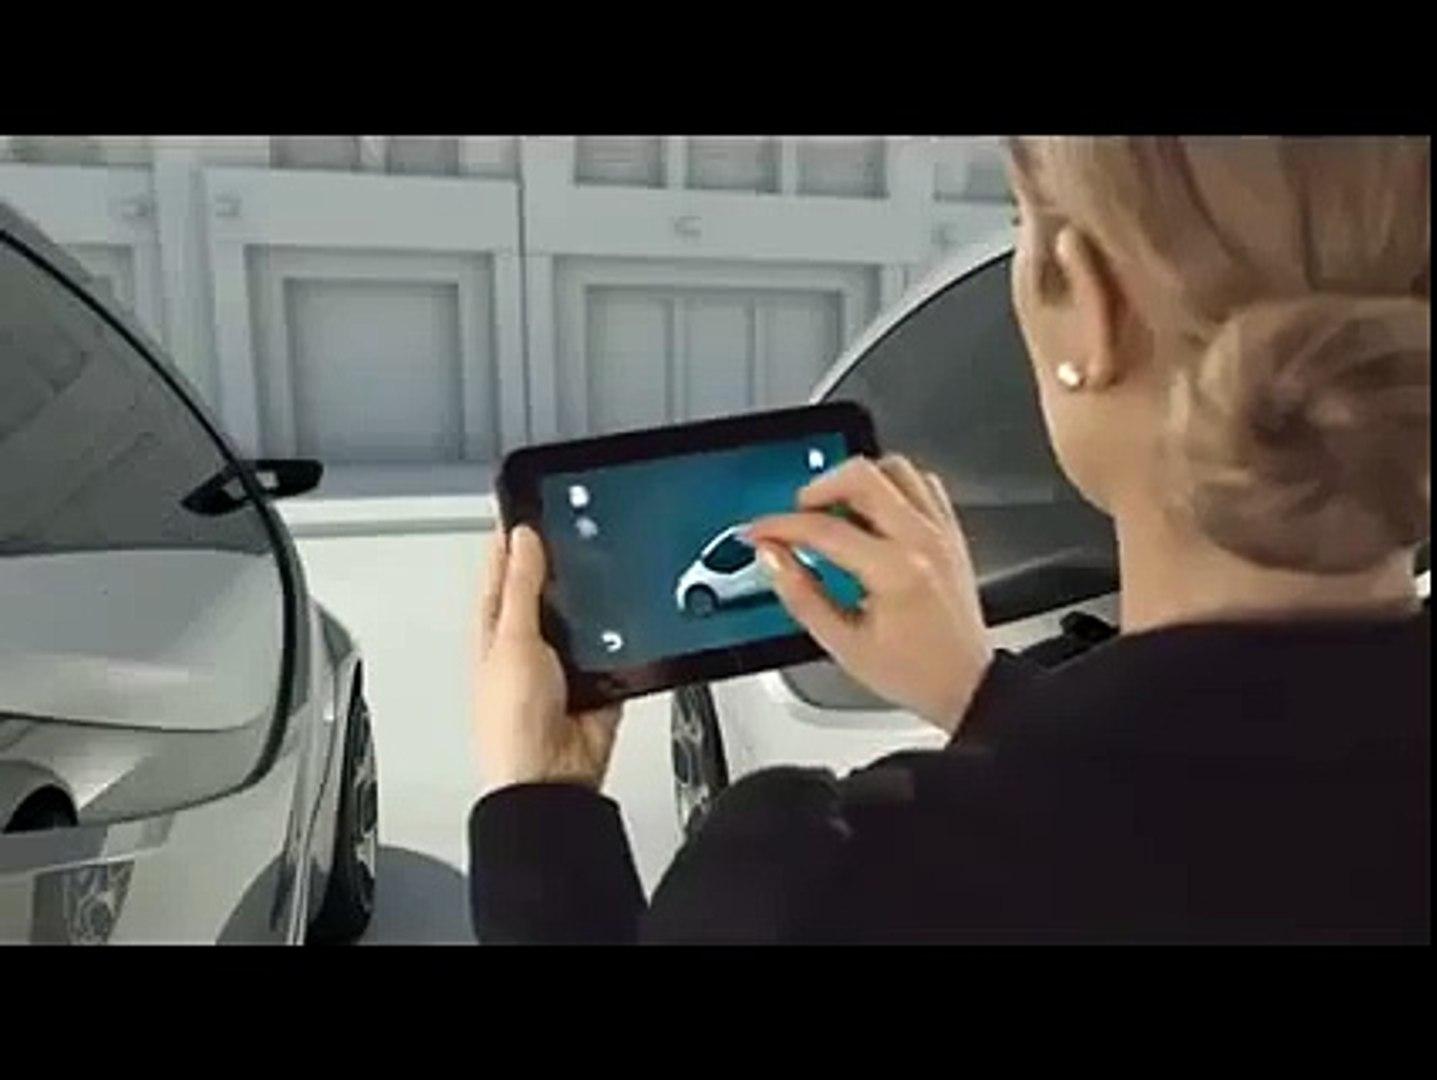 car 2050 technology